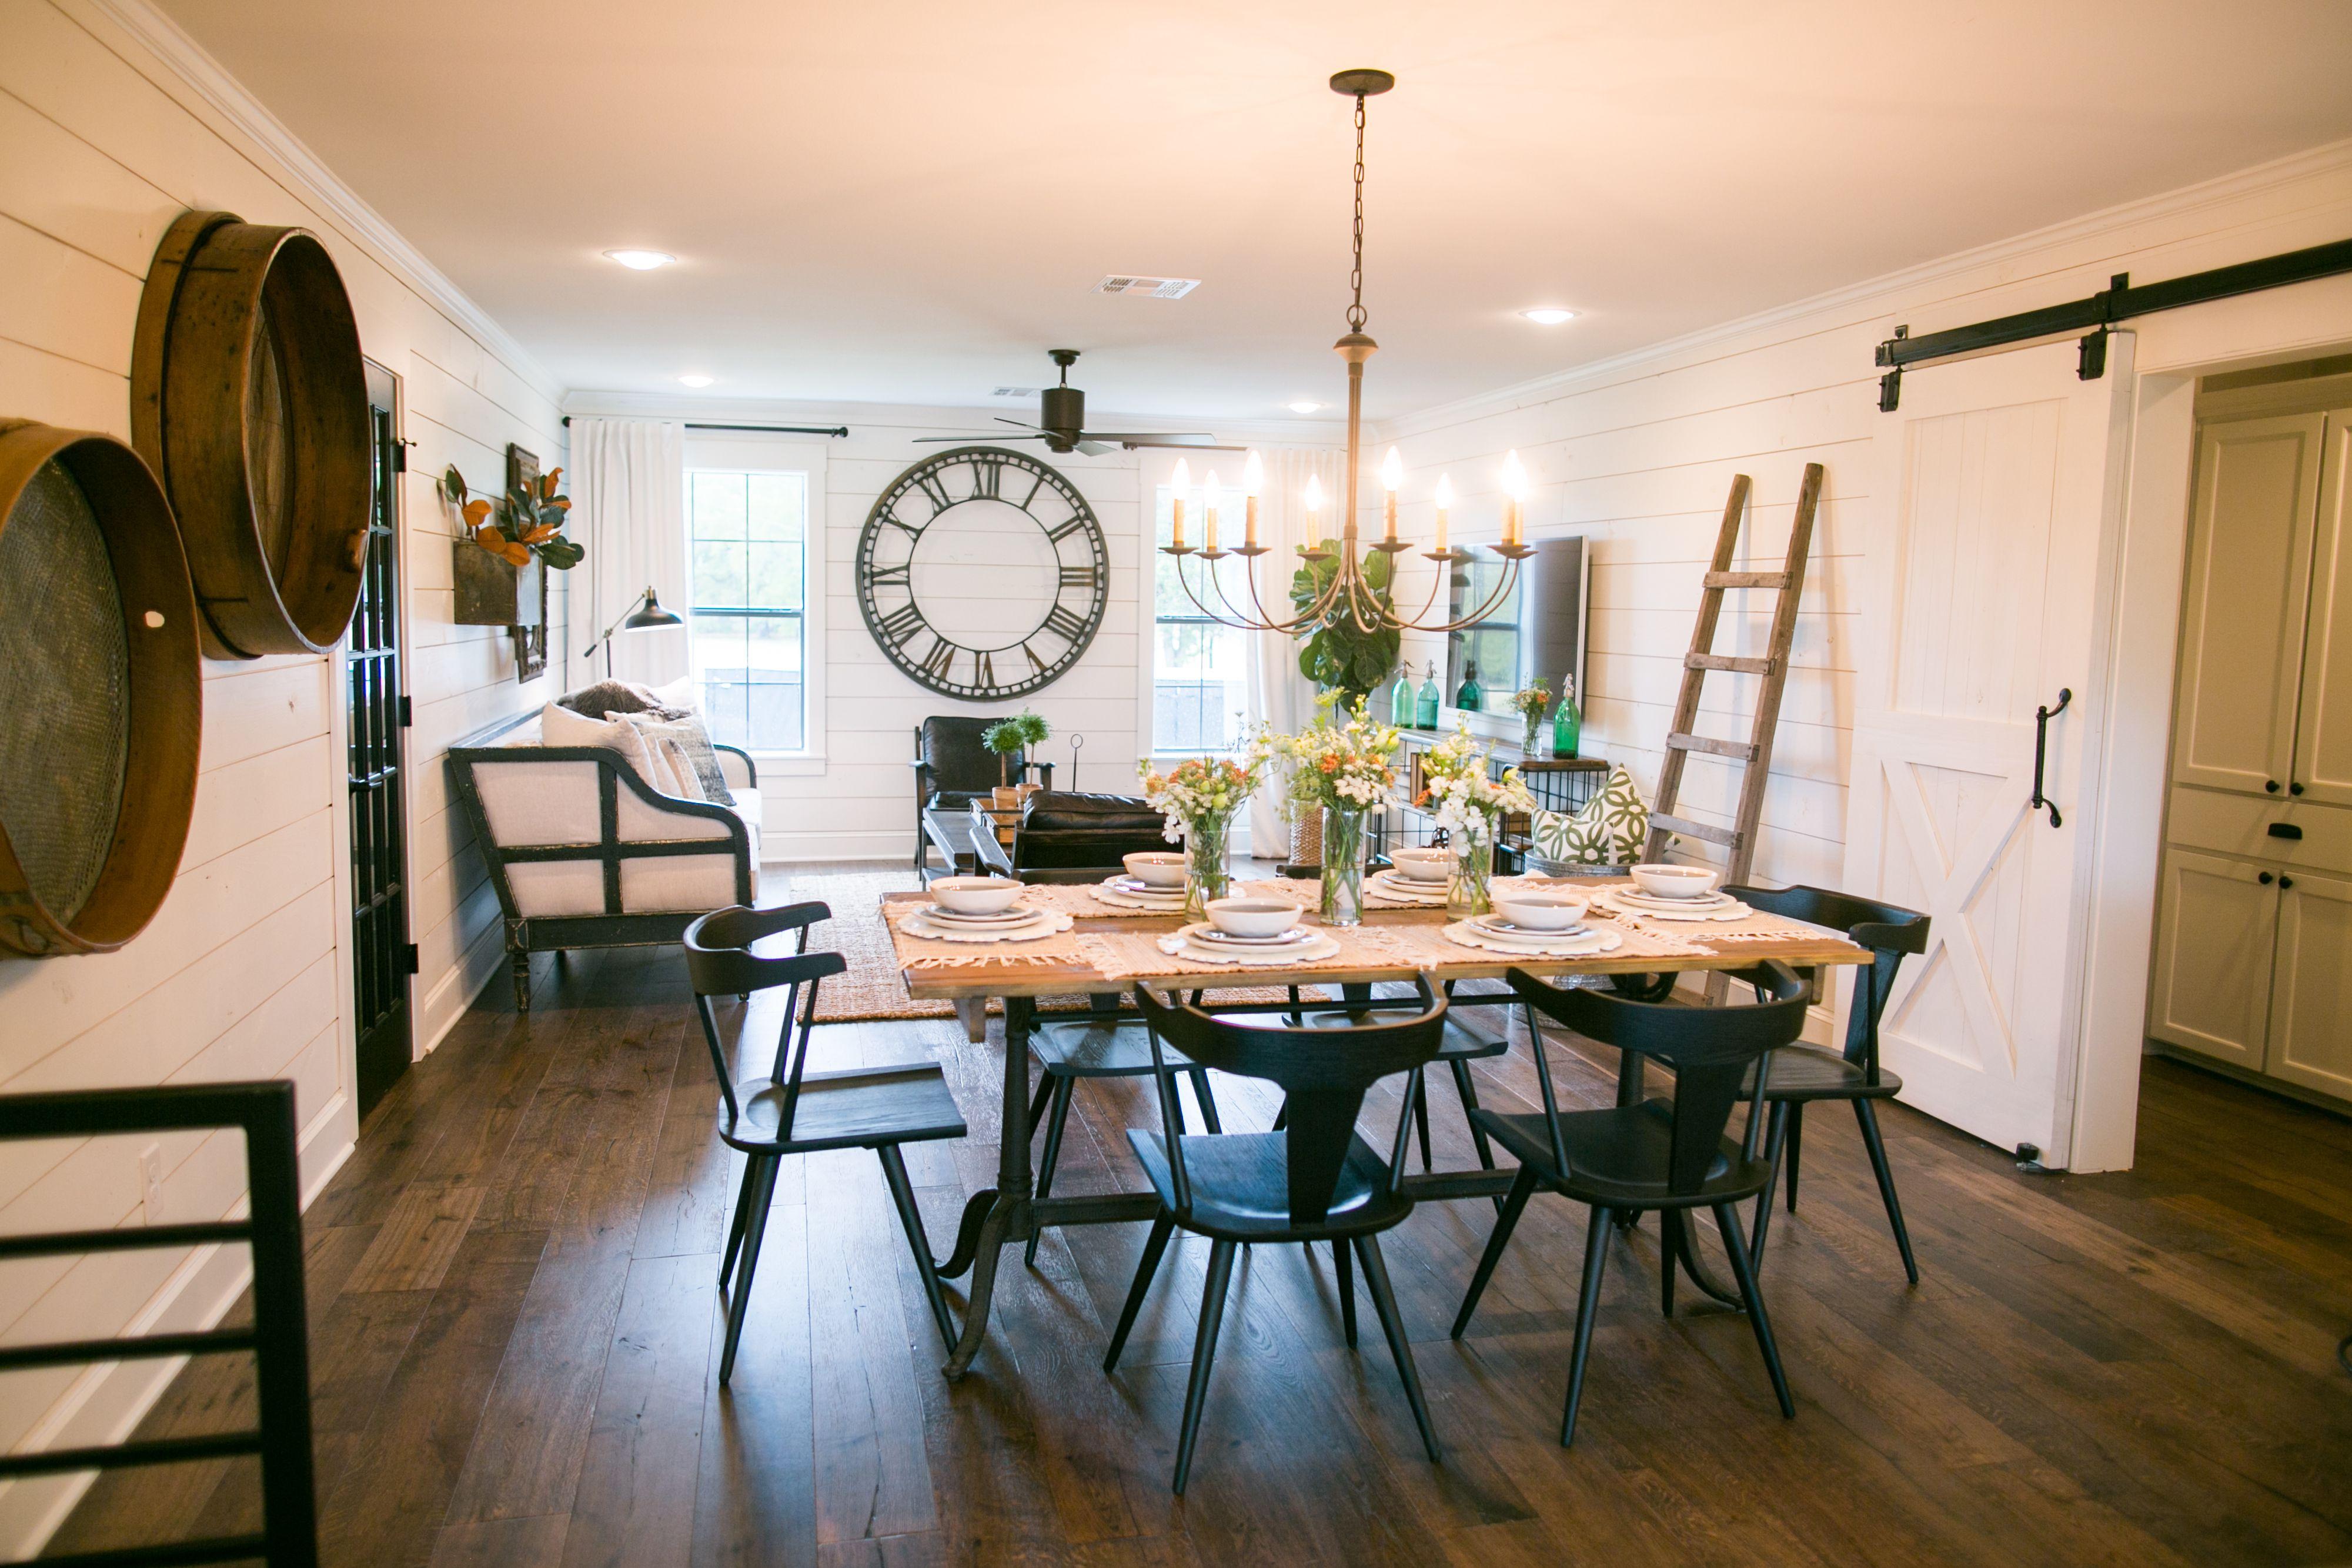 Fixer upper barndominium kitchen - Episode 06 The Bardominium Magnolia Market